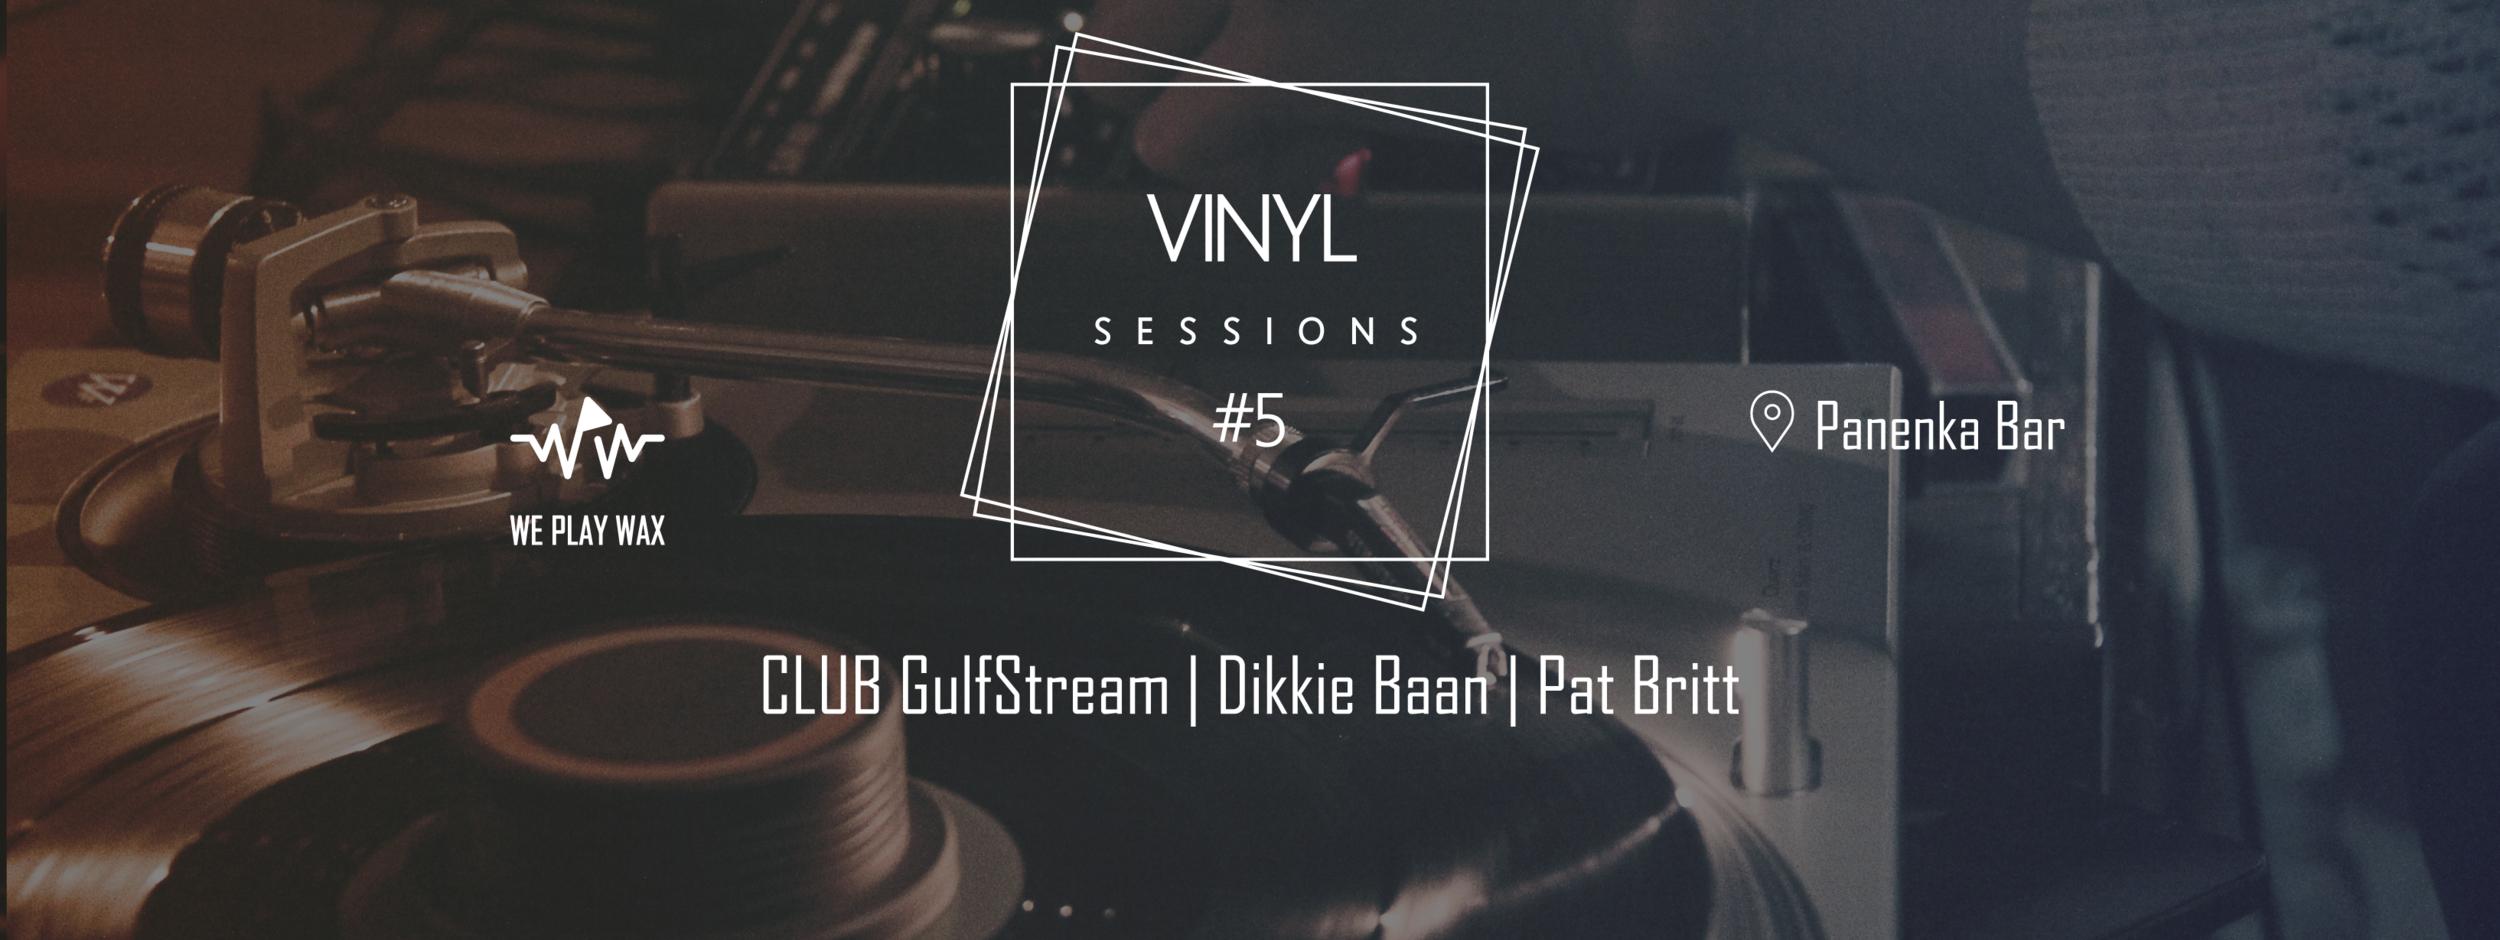 Vinyl Sessions #05 - Club Gulfstream